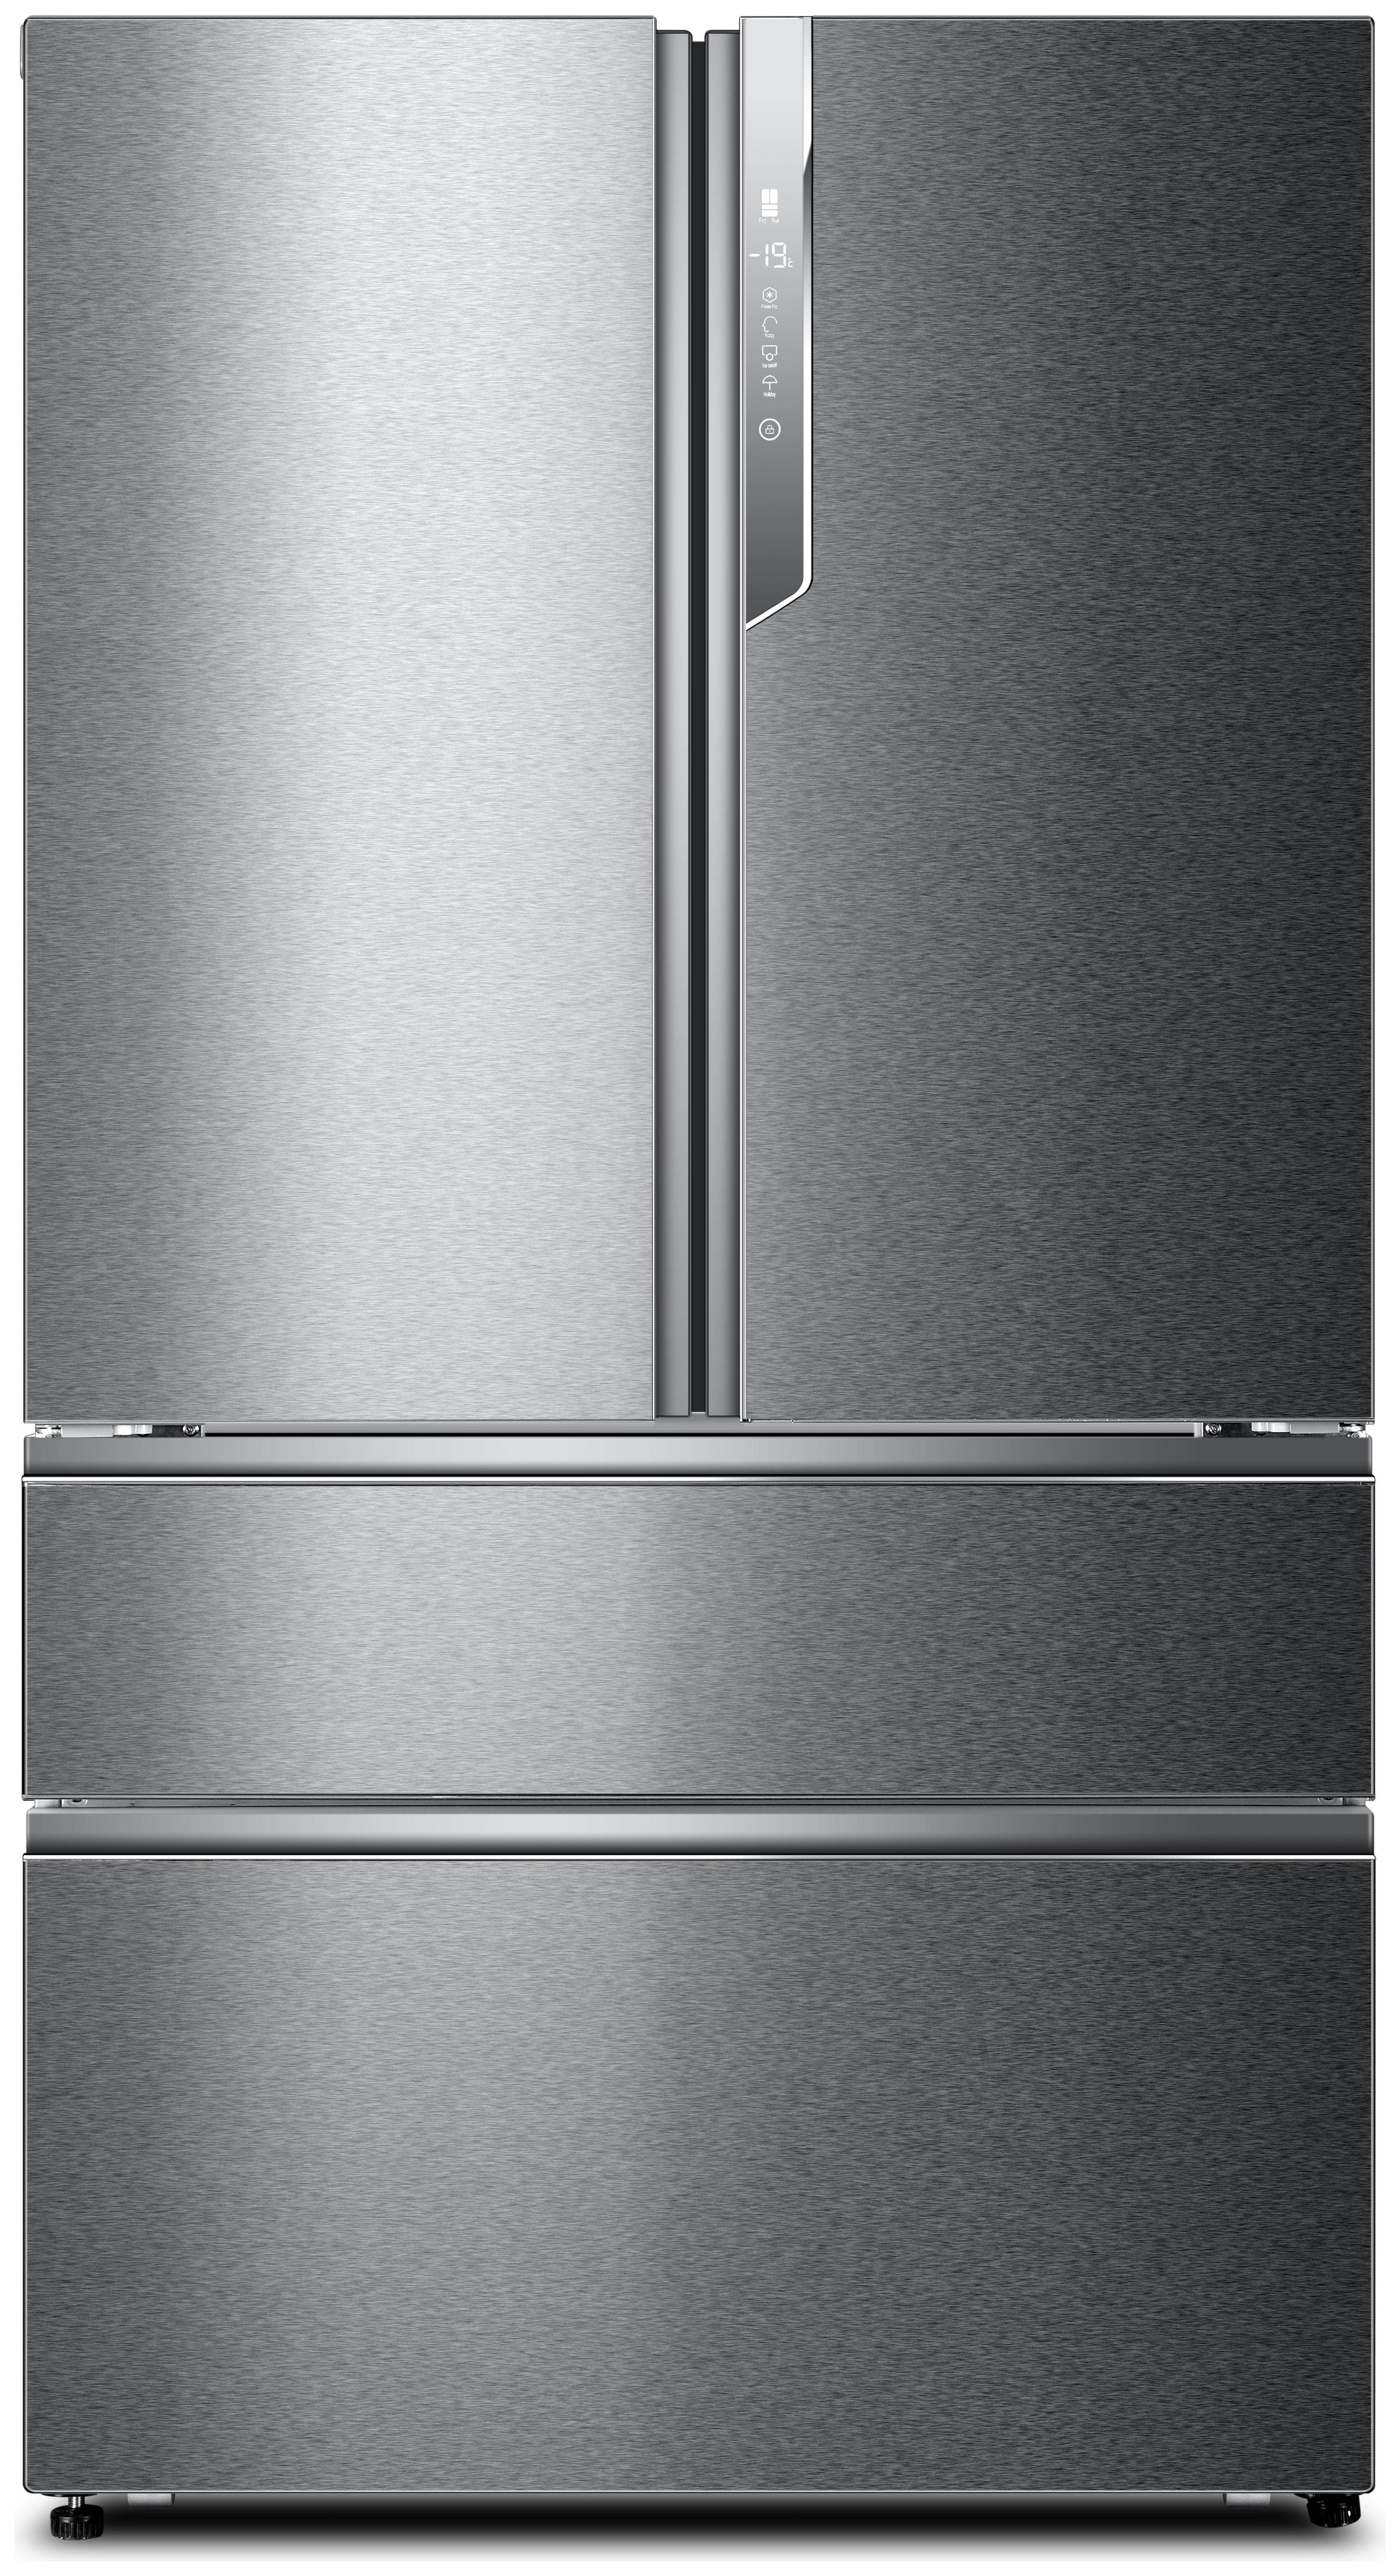 Image of Haier HB25FSSAAA American Fridge Freezer - Stainless Steel.